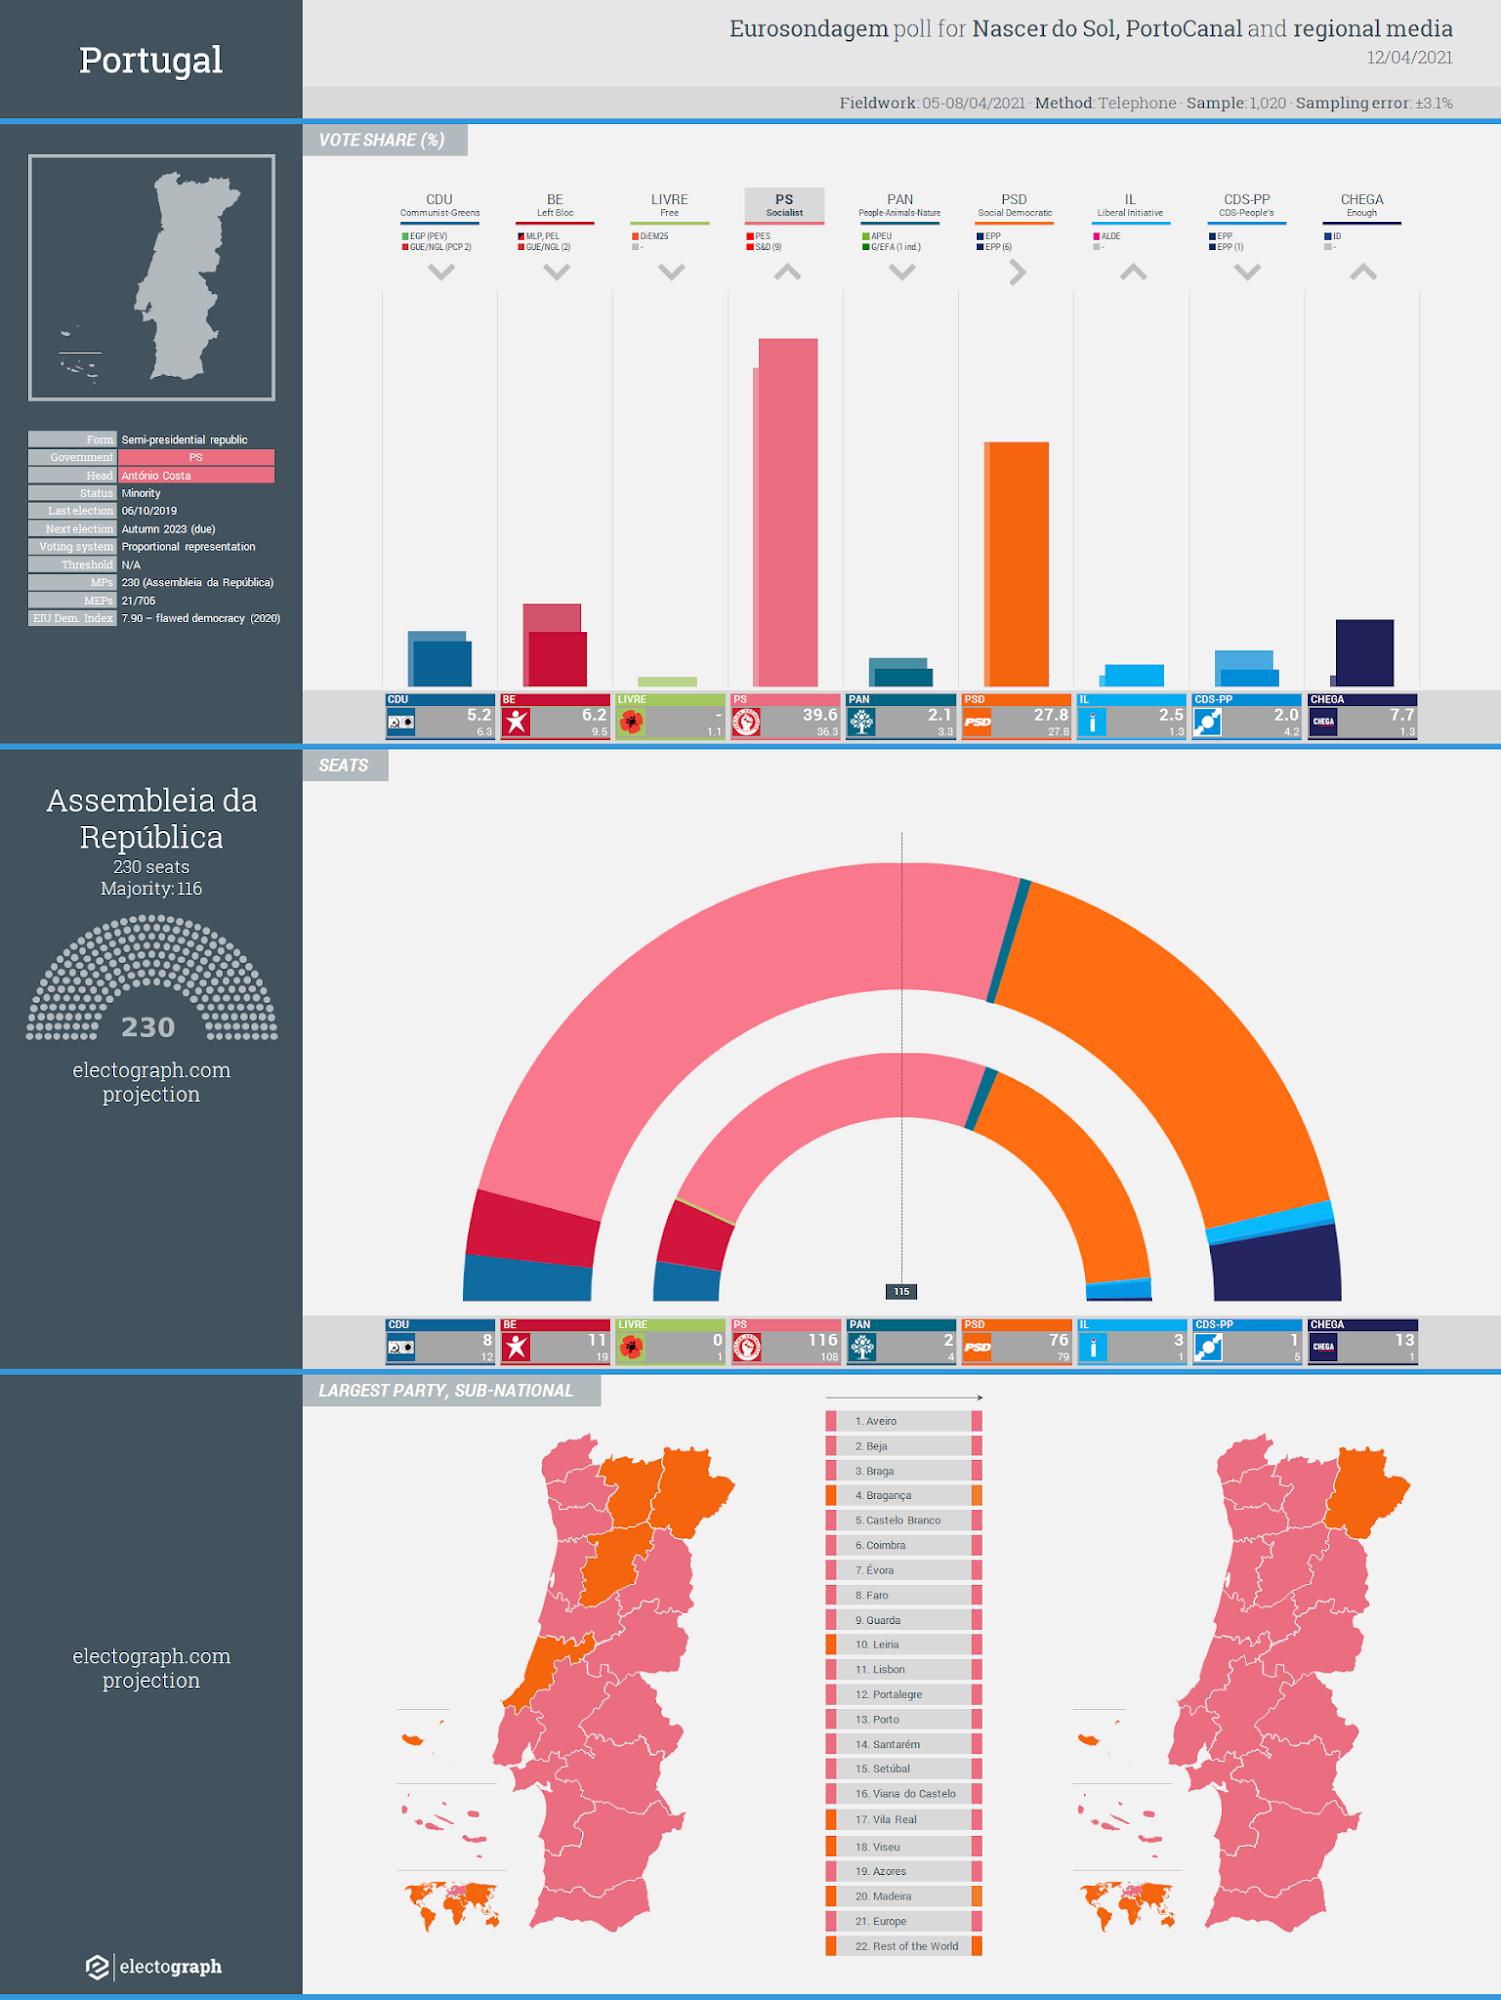 PORTUGAL: Eurosondagem poll chart for Sol and Porto Canal, 12 April 2021